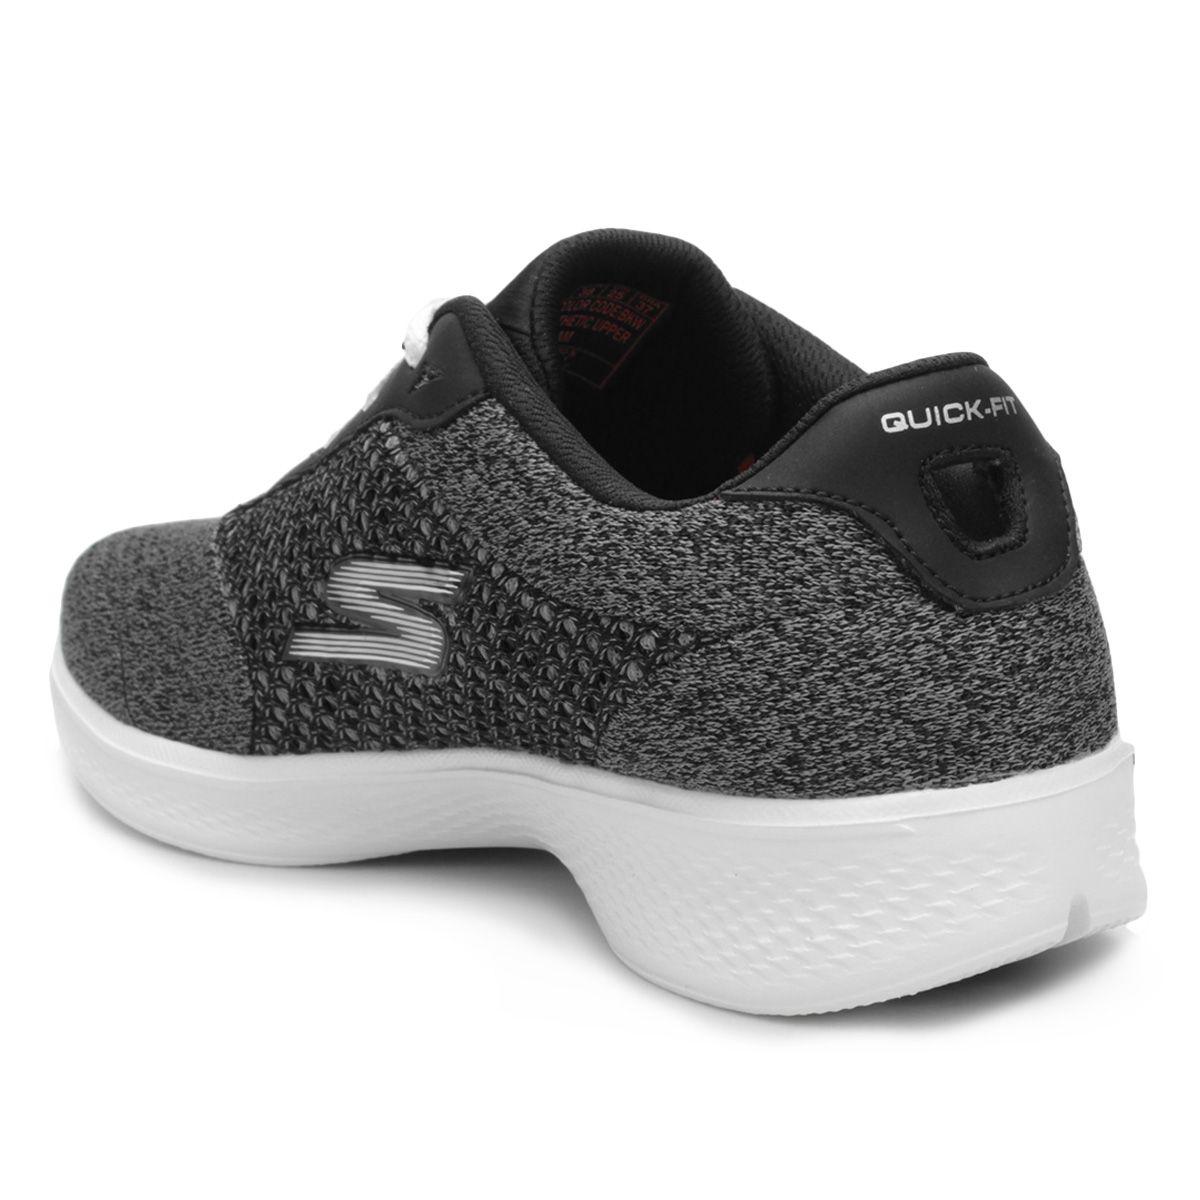 Tênis Skechers Go Walk 4 Exceed Feminino - Preto e Branco